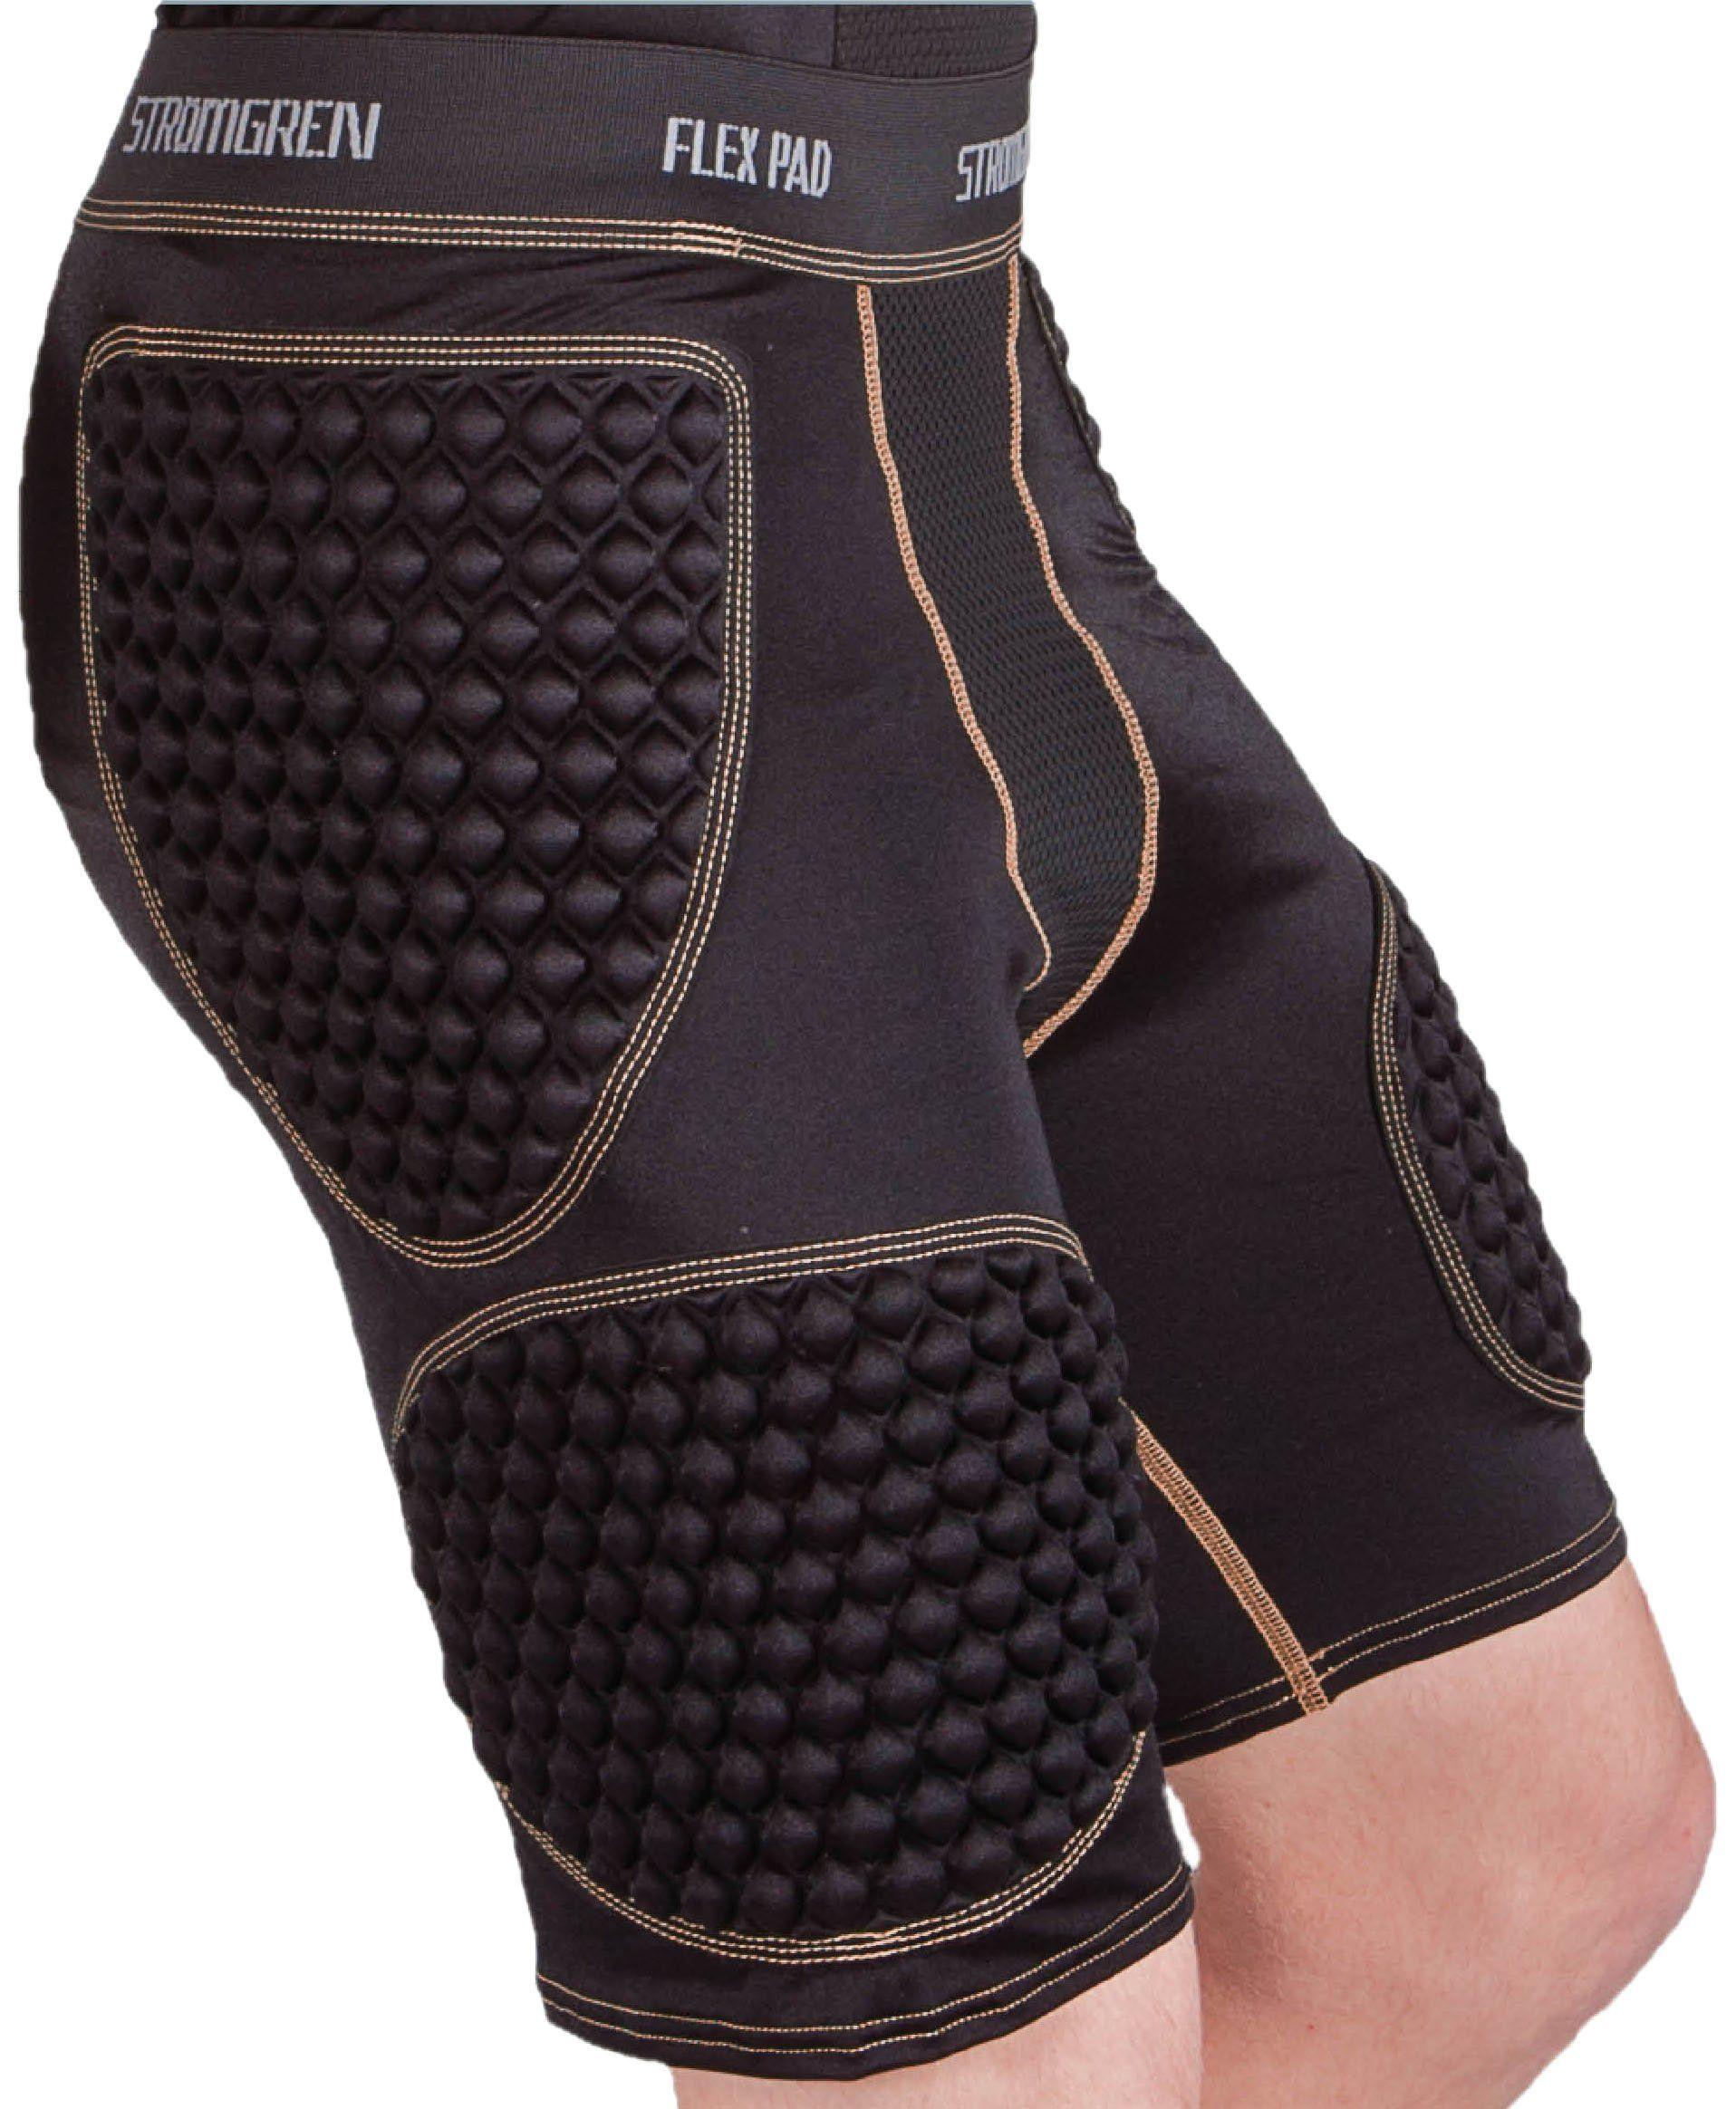 Under Armour Compression Shorts With Pads Stromgren Flex ...